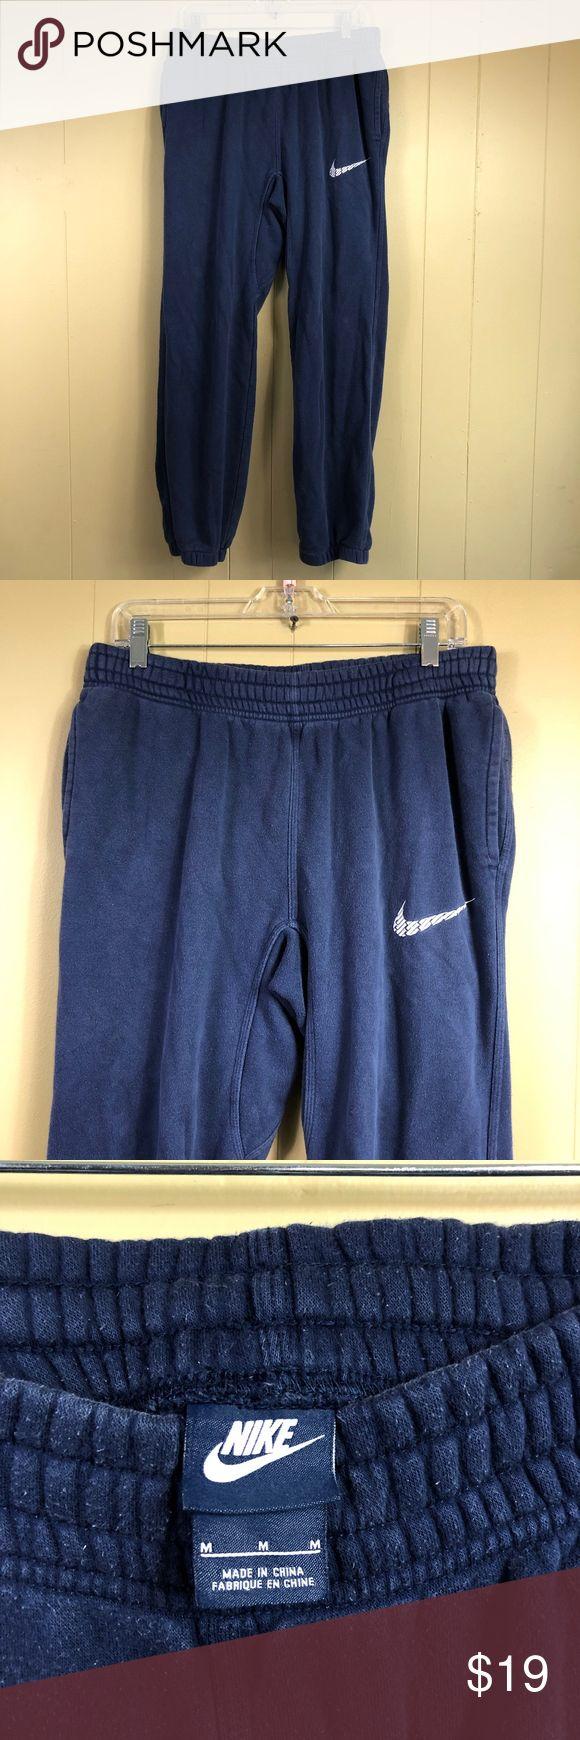 Nike Men's Elastic Waist Sweat Pants Fleece Nike Men's Elastic Waist Swe…